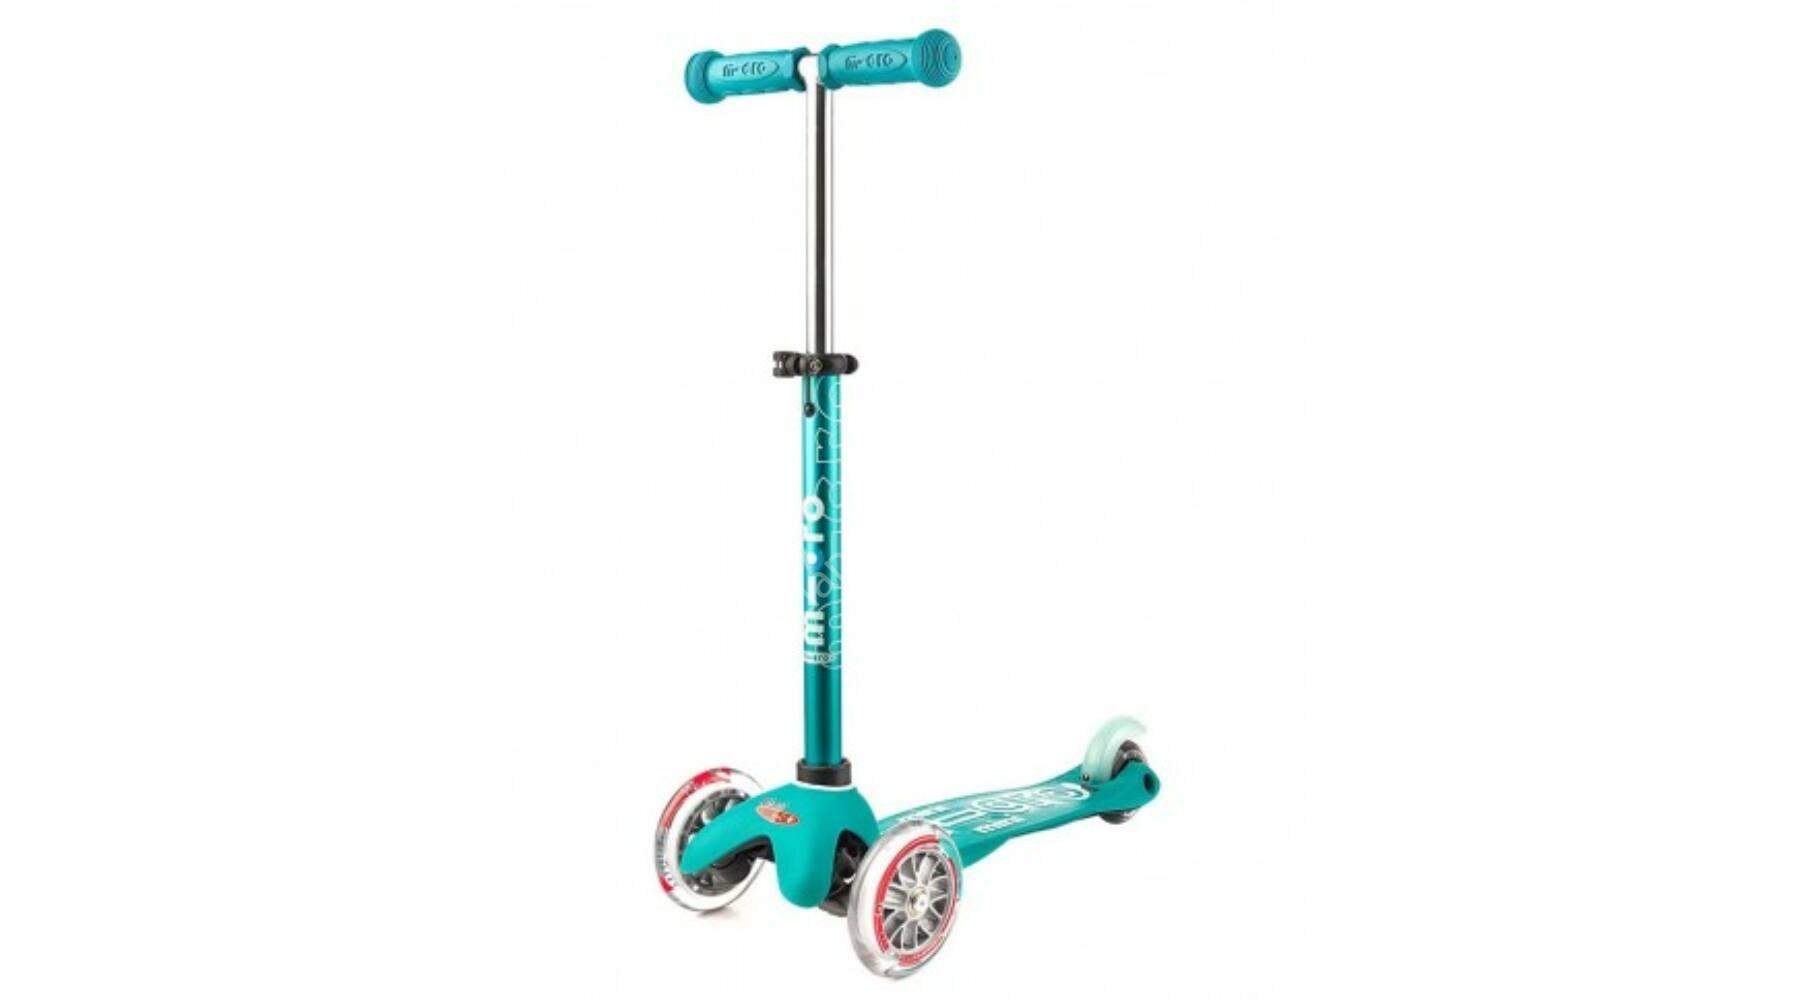 c7eba37053 3in1 Mini Micro Deluxe roller, aqua - a-Wear Sport - Roller ...